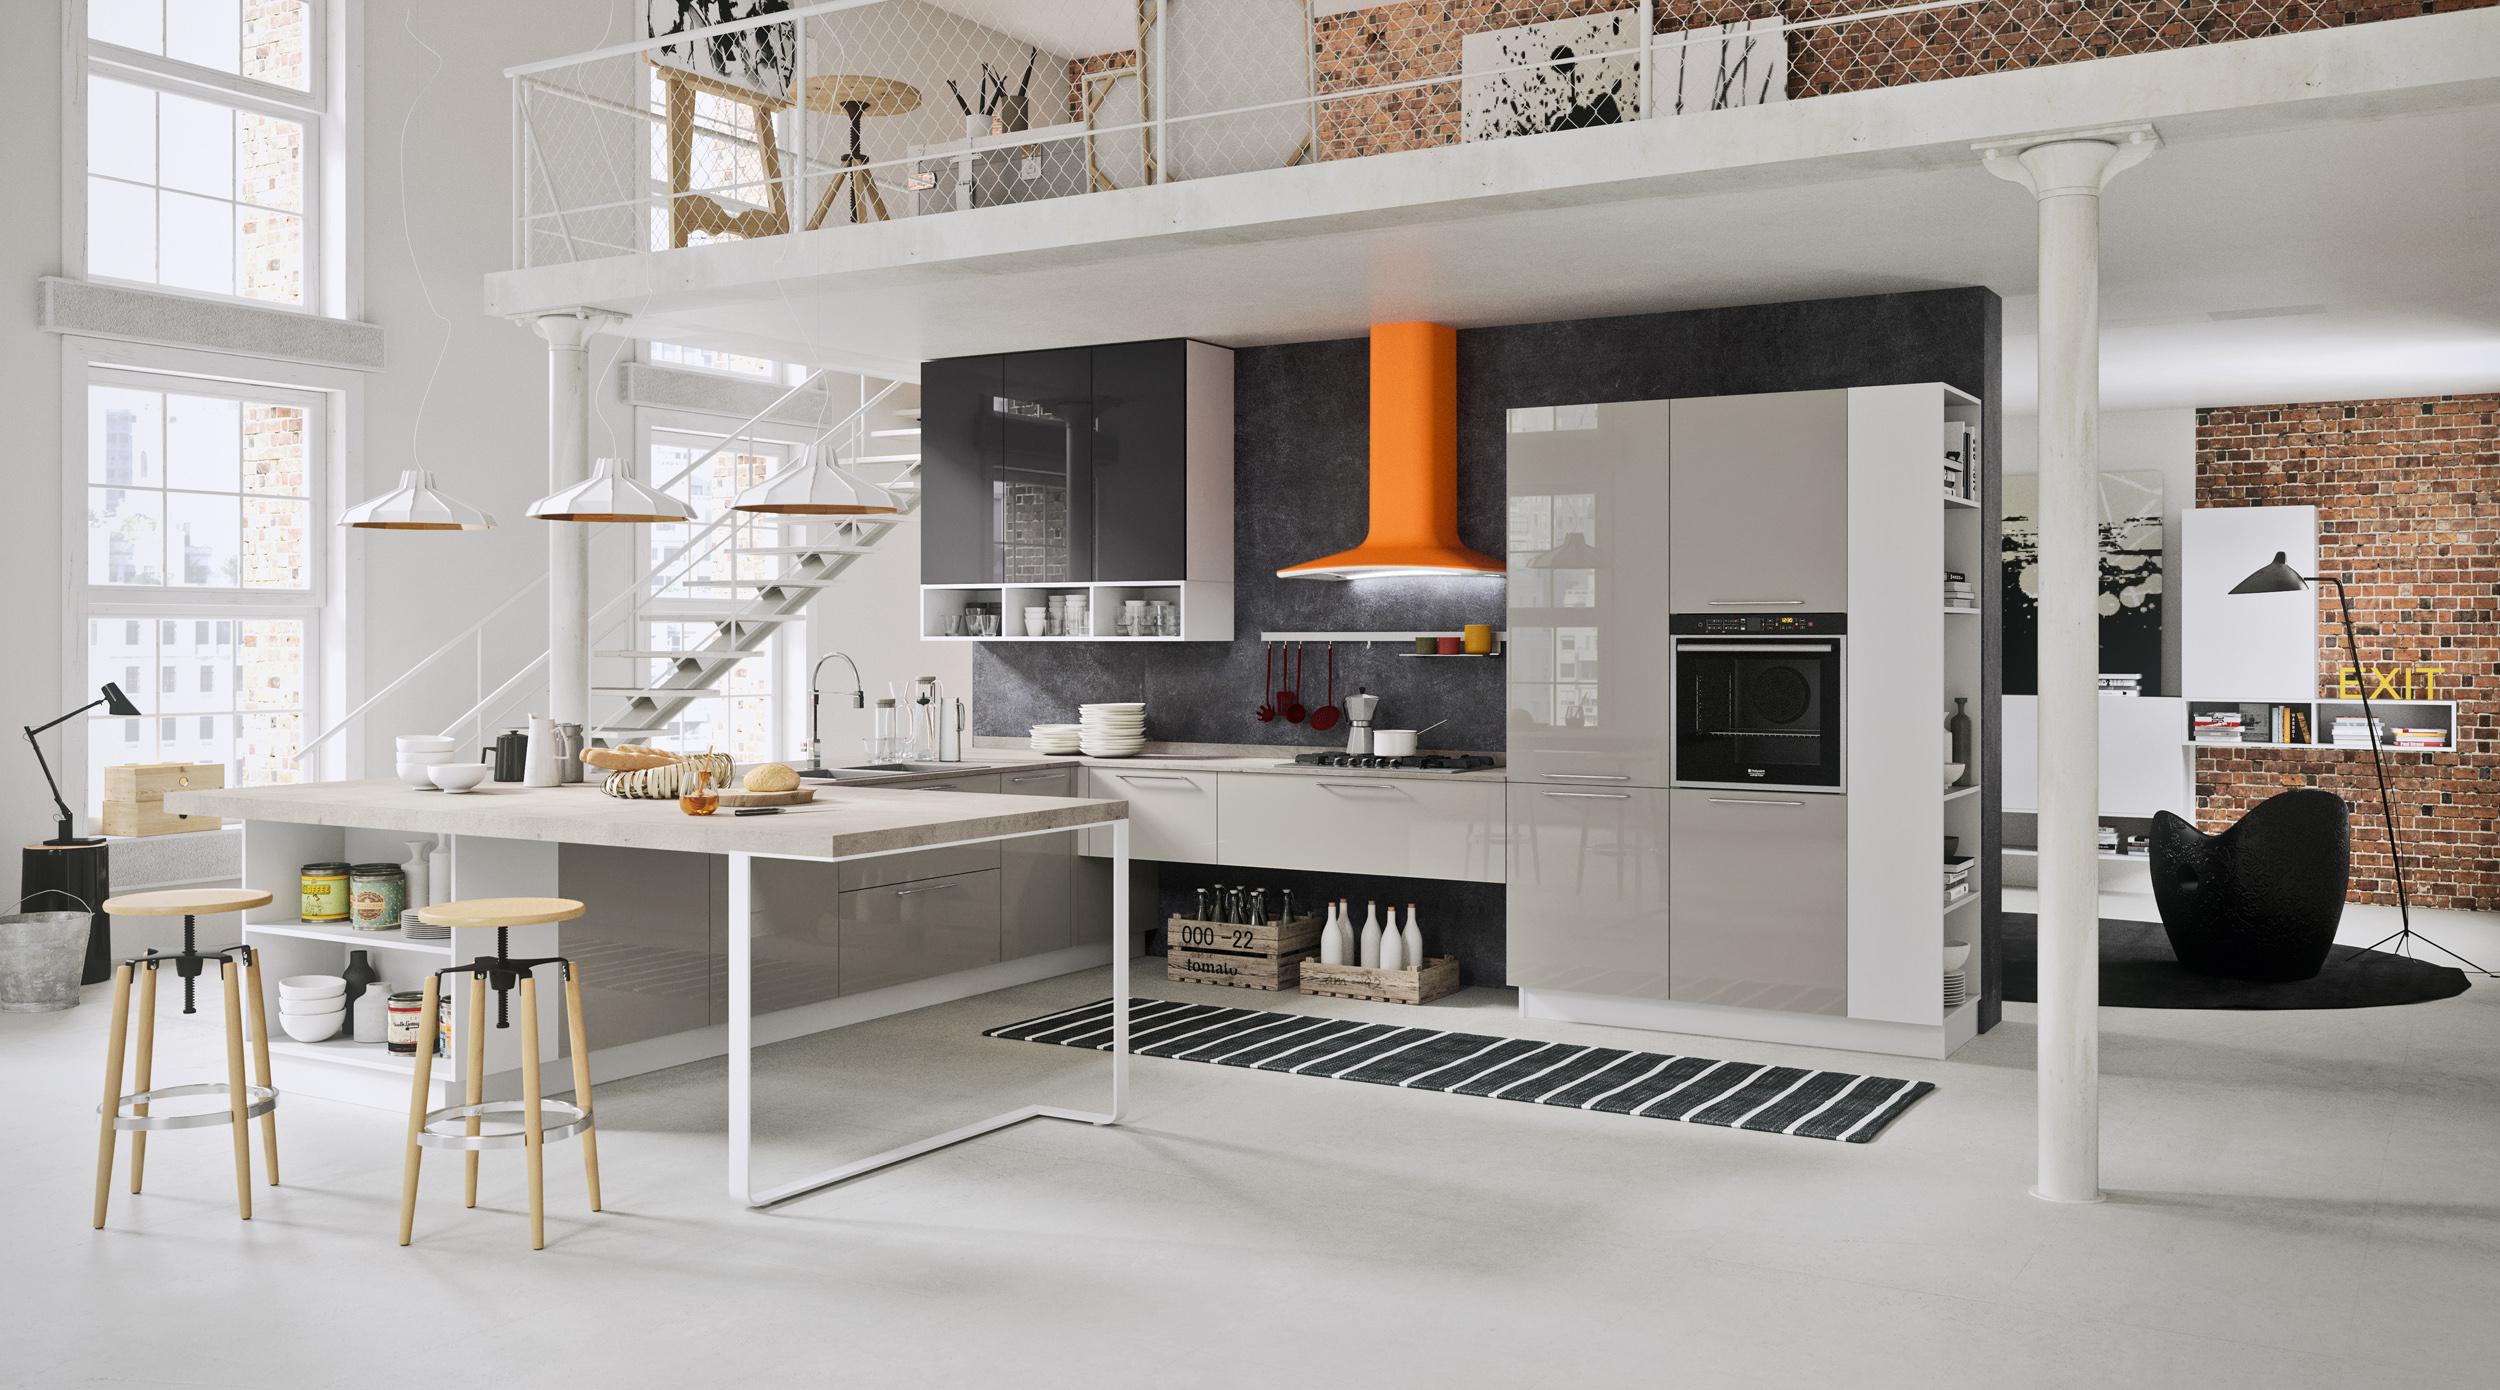 Cucine Ar Tre - Deper Mobili S.r.L.